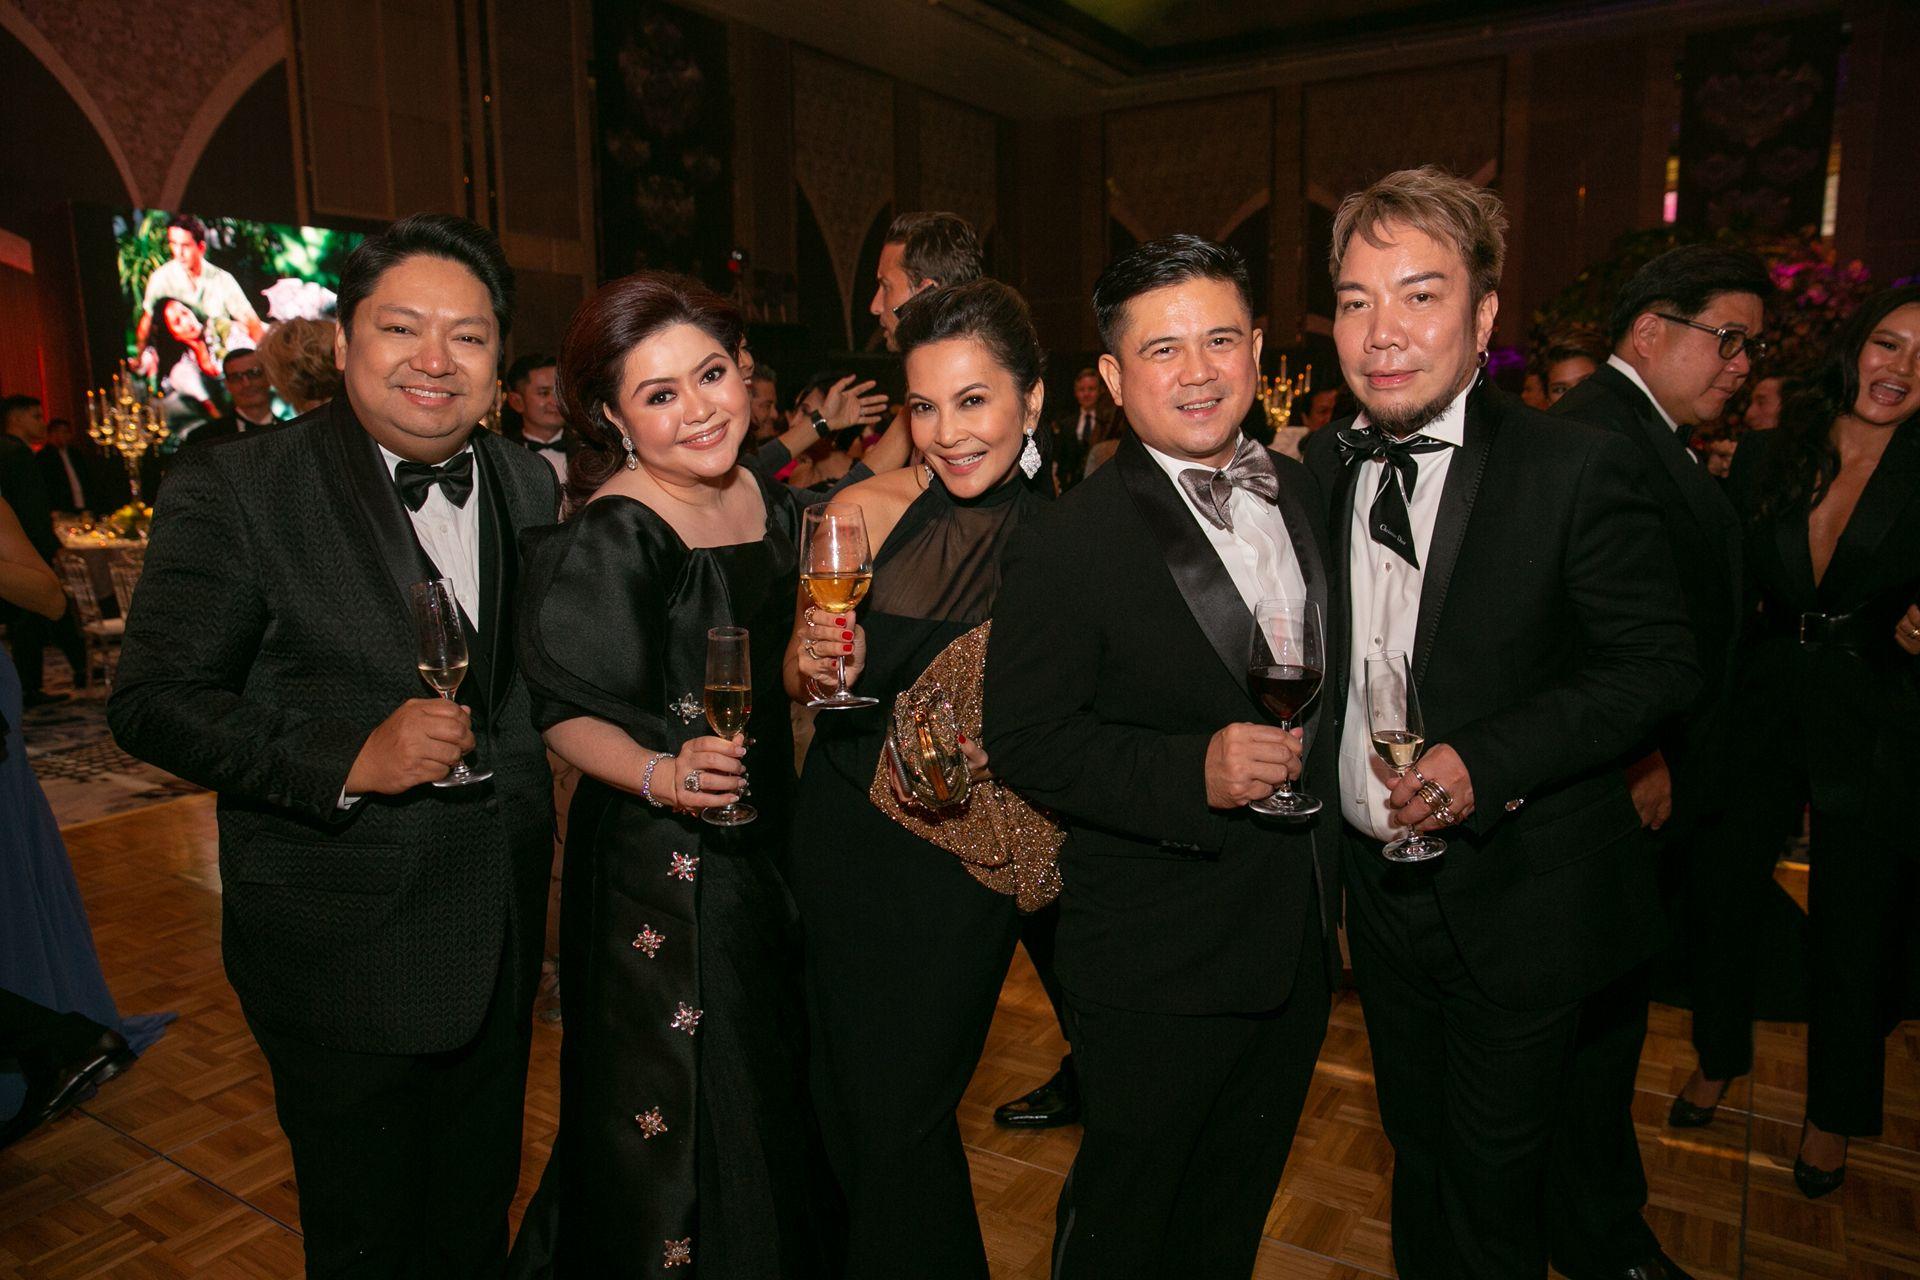 Joel and Carla Del Prado, Charmaine and Mike Lagman and Ian Giron